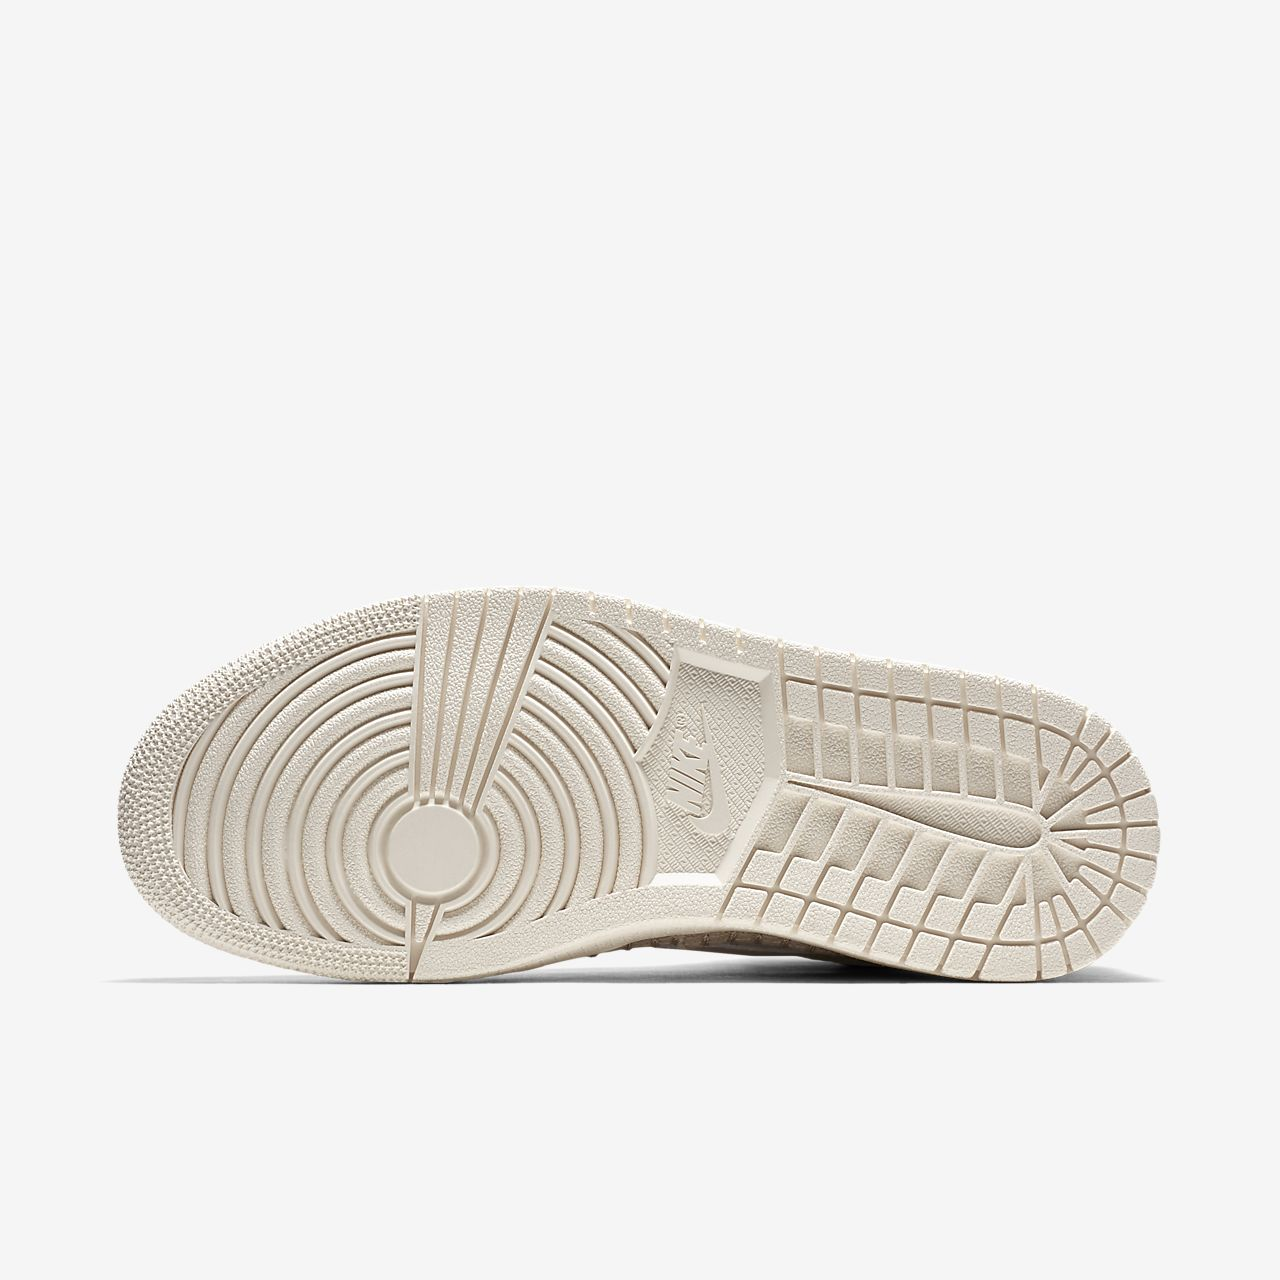 06a7b3f867fe Nike Air Jordan 1 Retro High Premium Women s Shoe. Nike.com BE